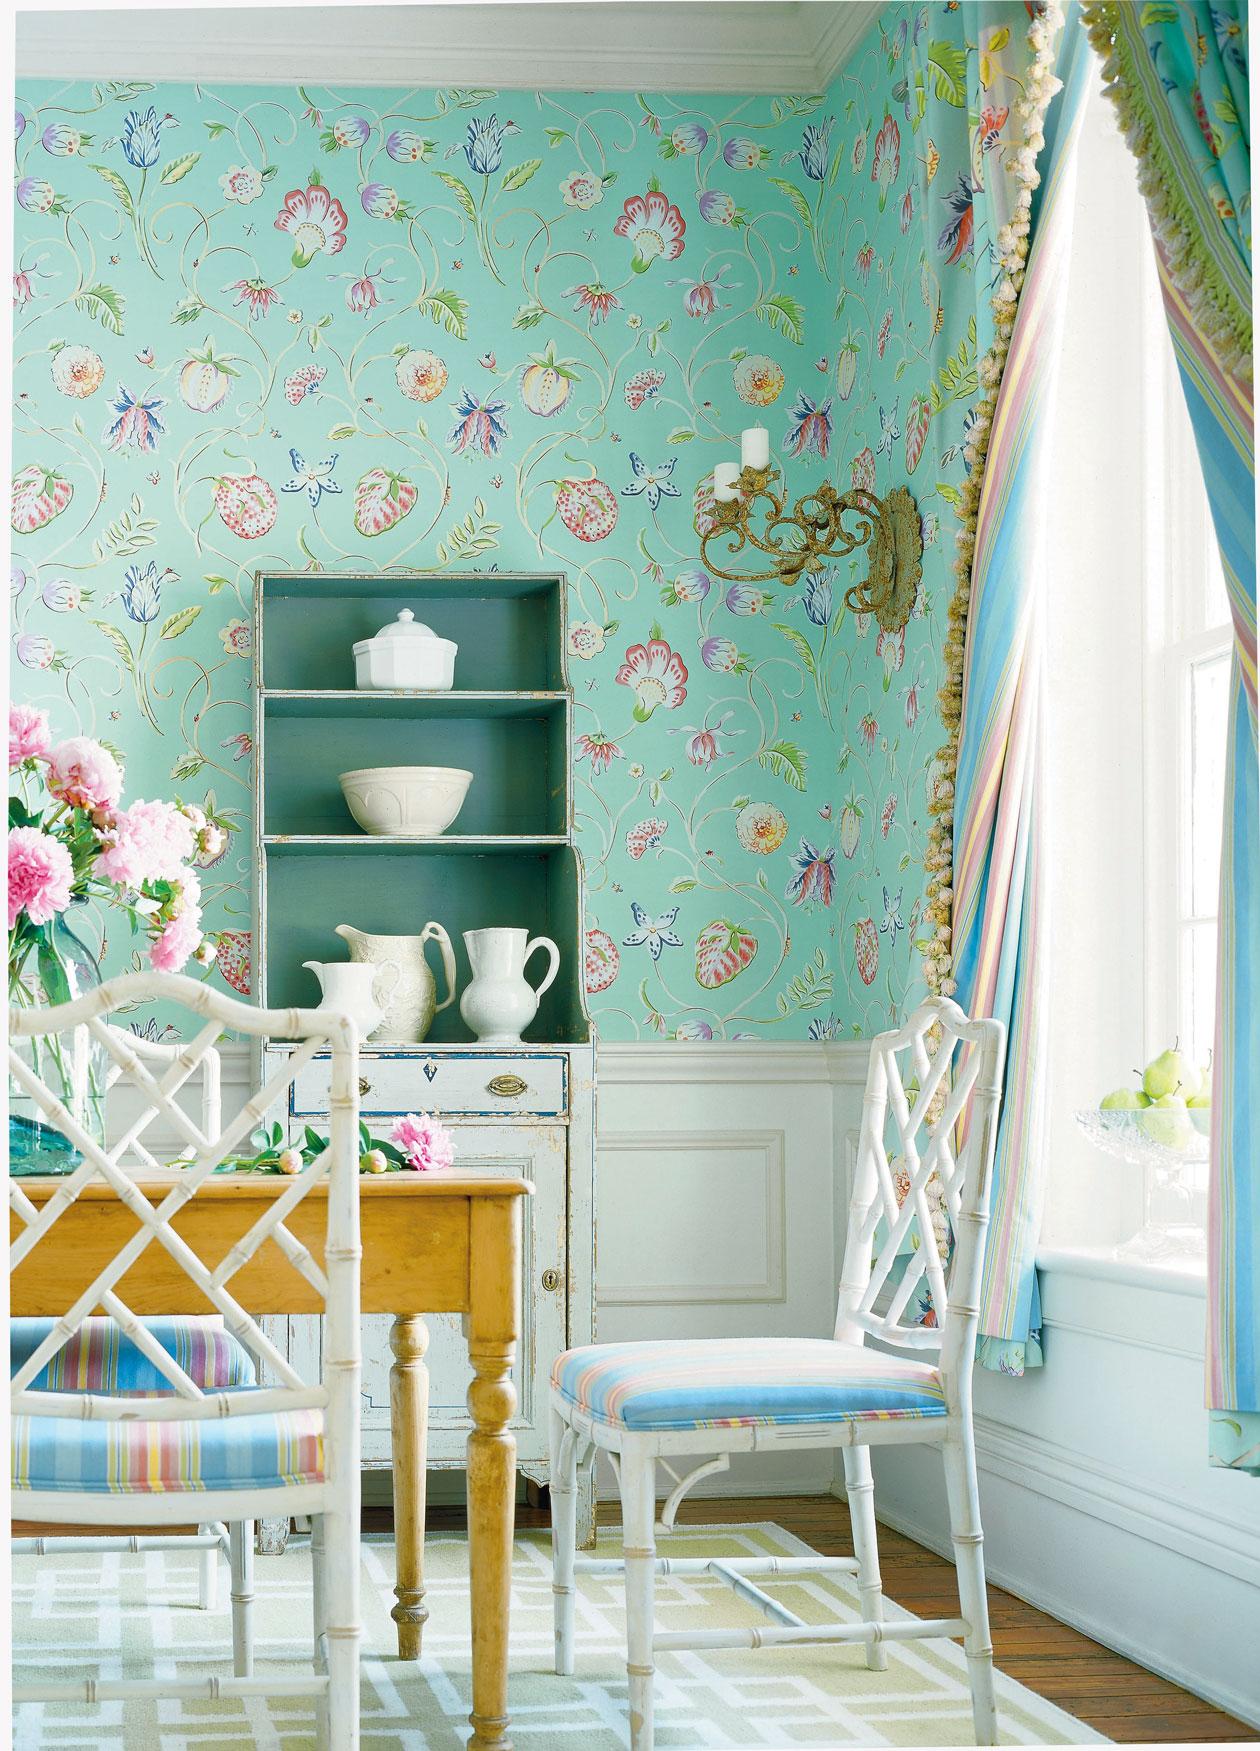 bright colored floral wallpaper